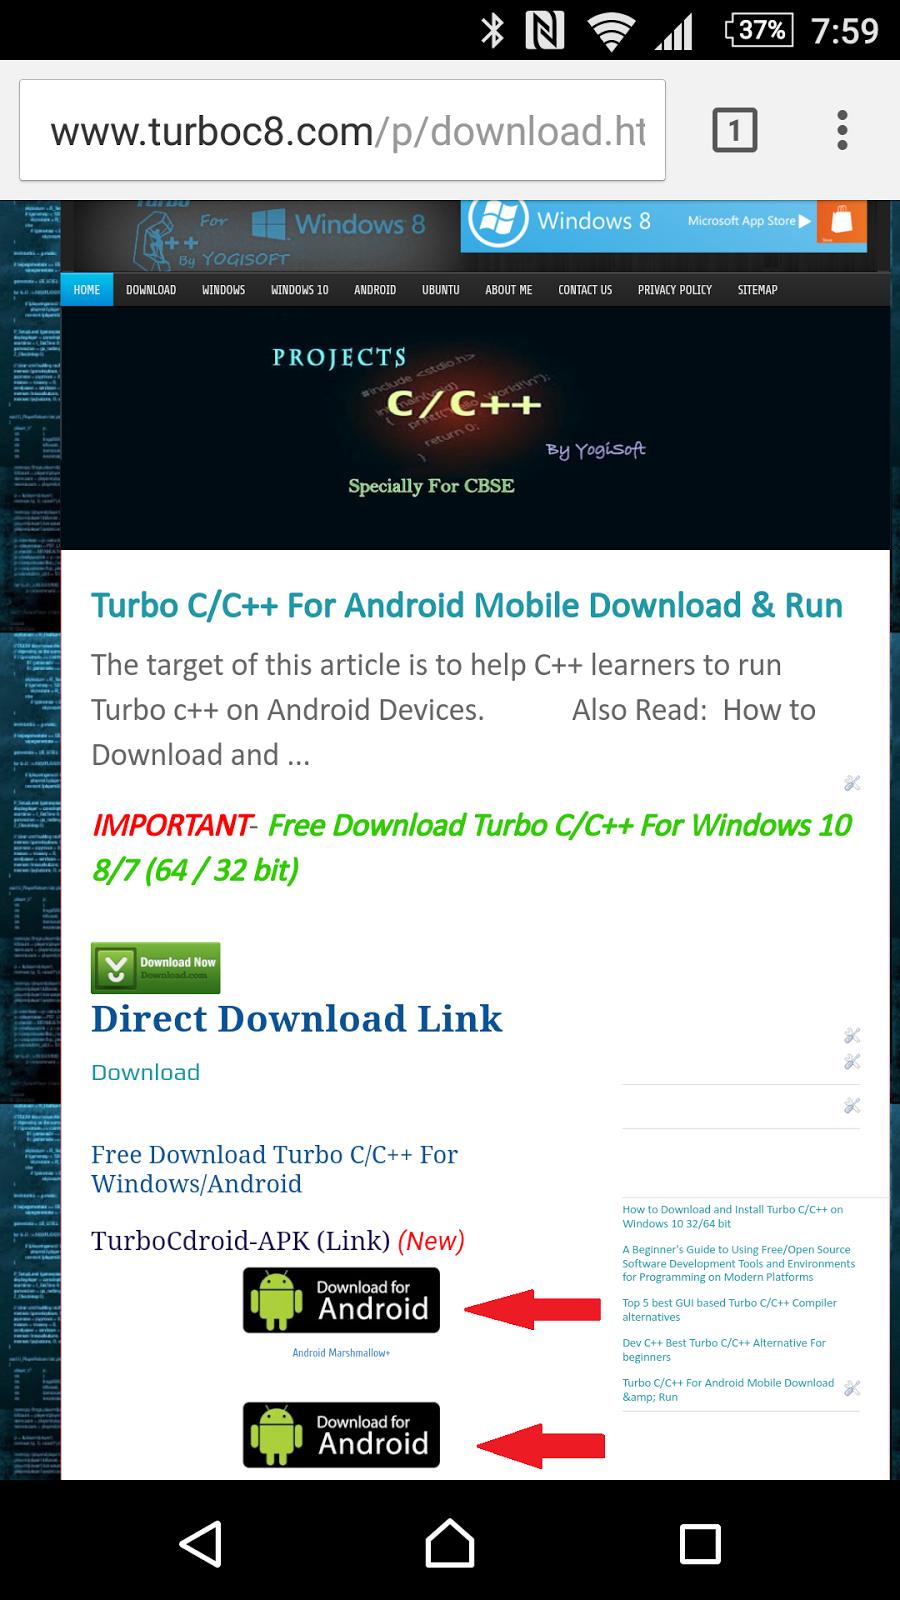 Download Descargar Windows Tag Audio 64 7 Bits Shell Editor Para Free